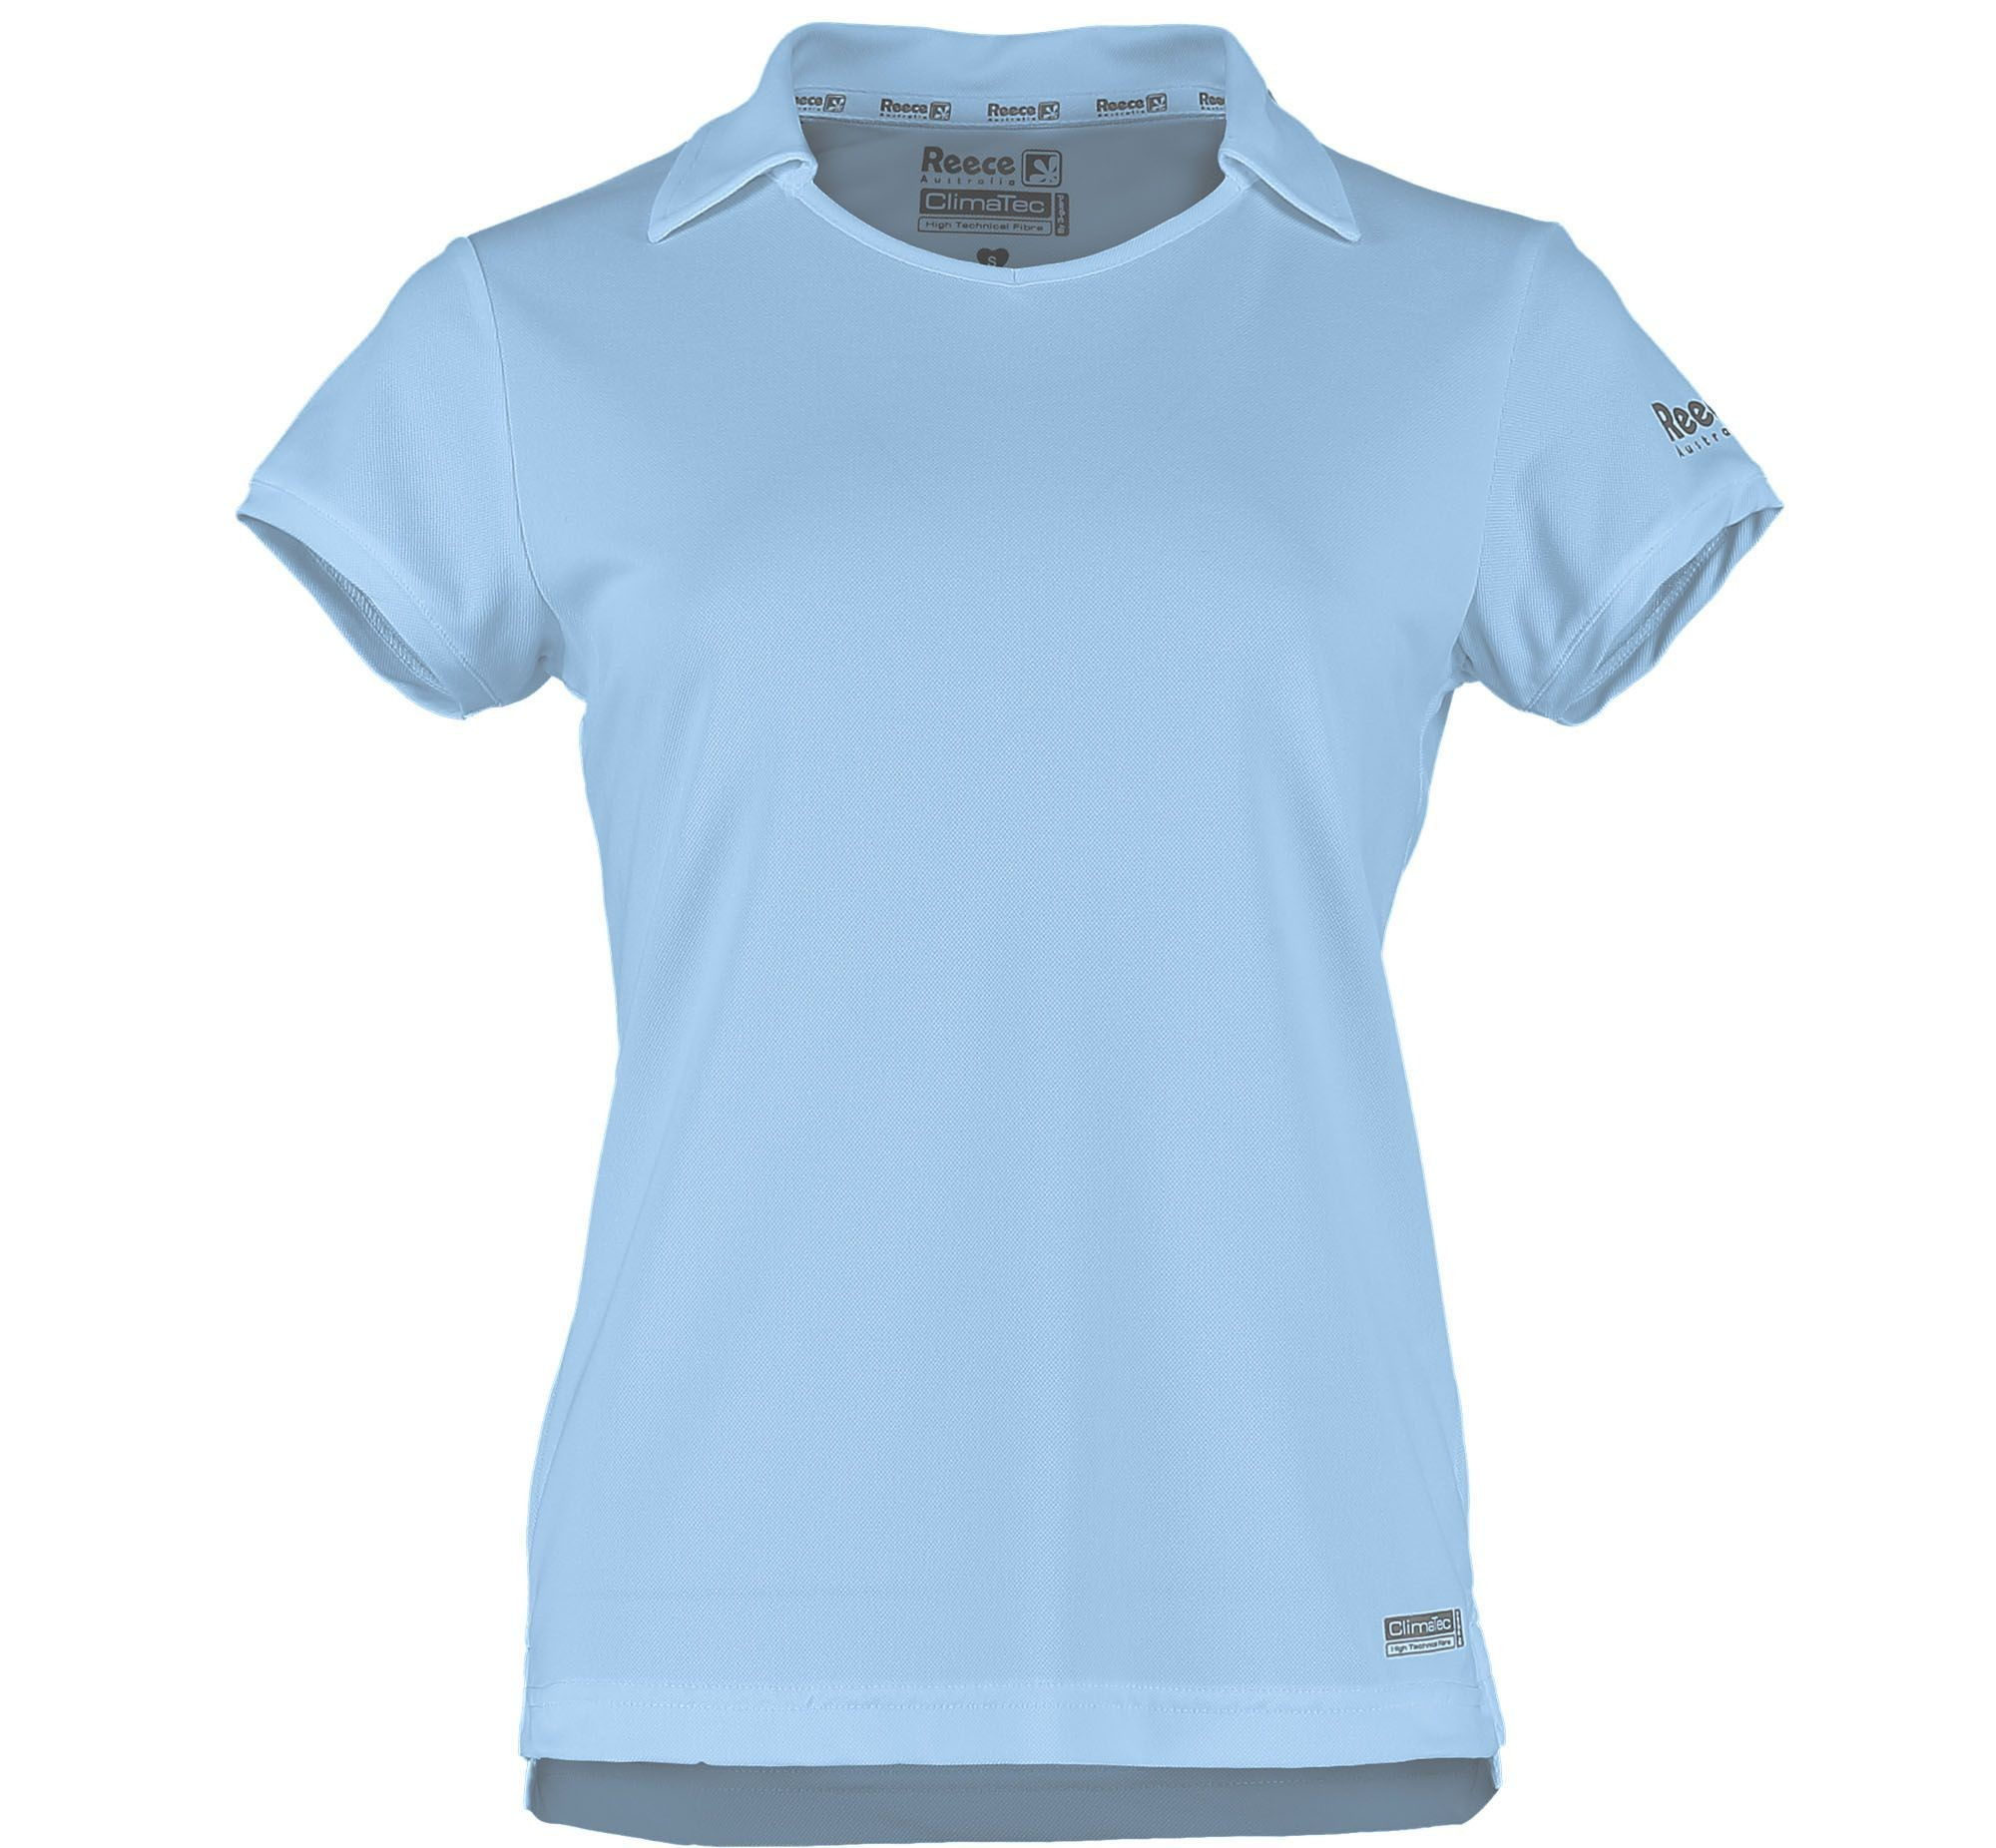 REECE AUSTRALIA ISA CLIMATEC koszulka tenisowa